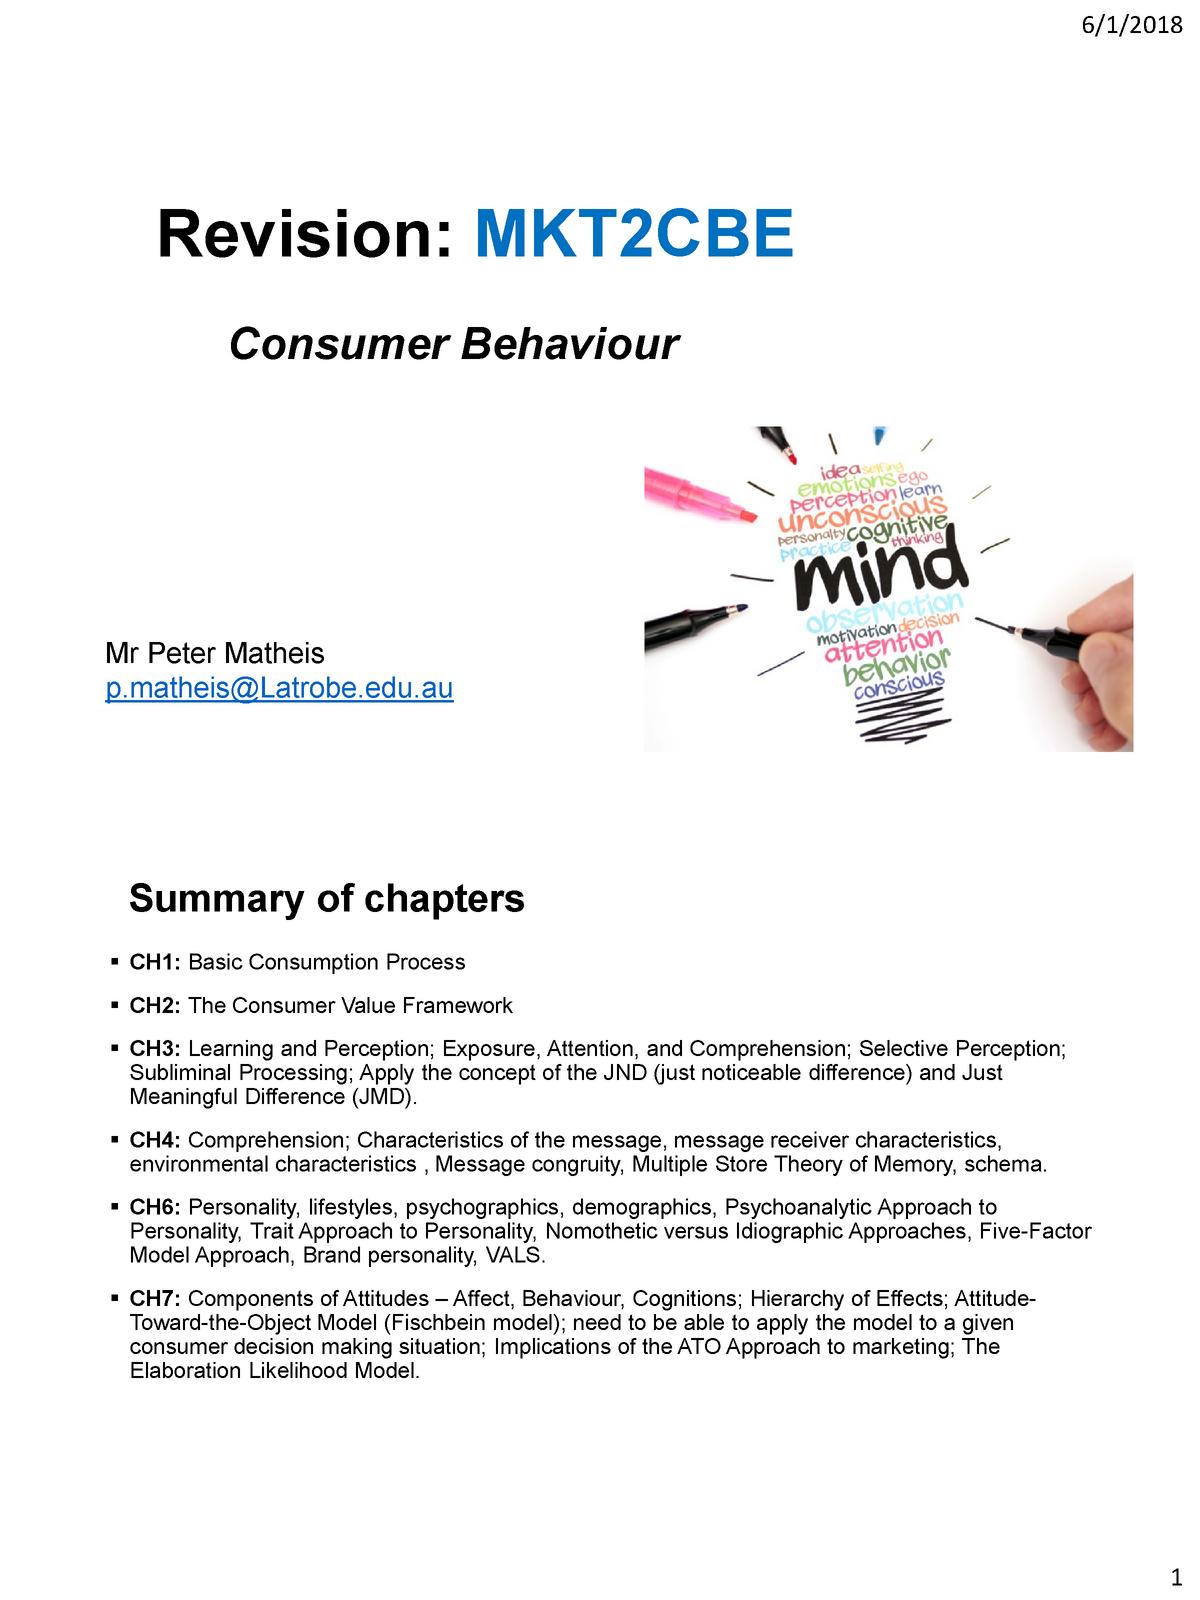 Practice Questions - Summary Consumer Behaviour - MKT2CBE